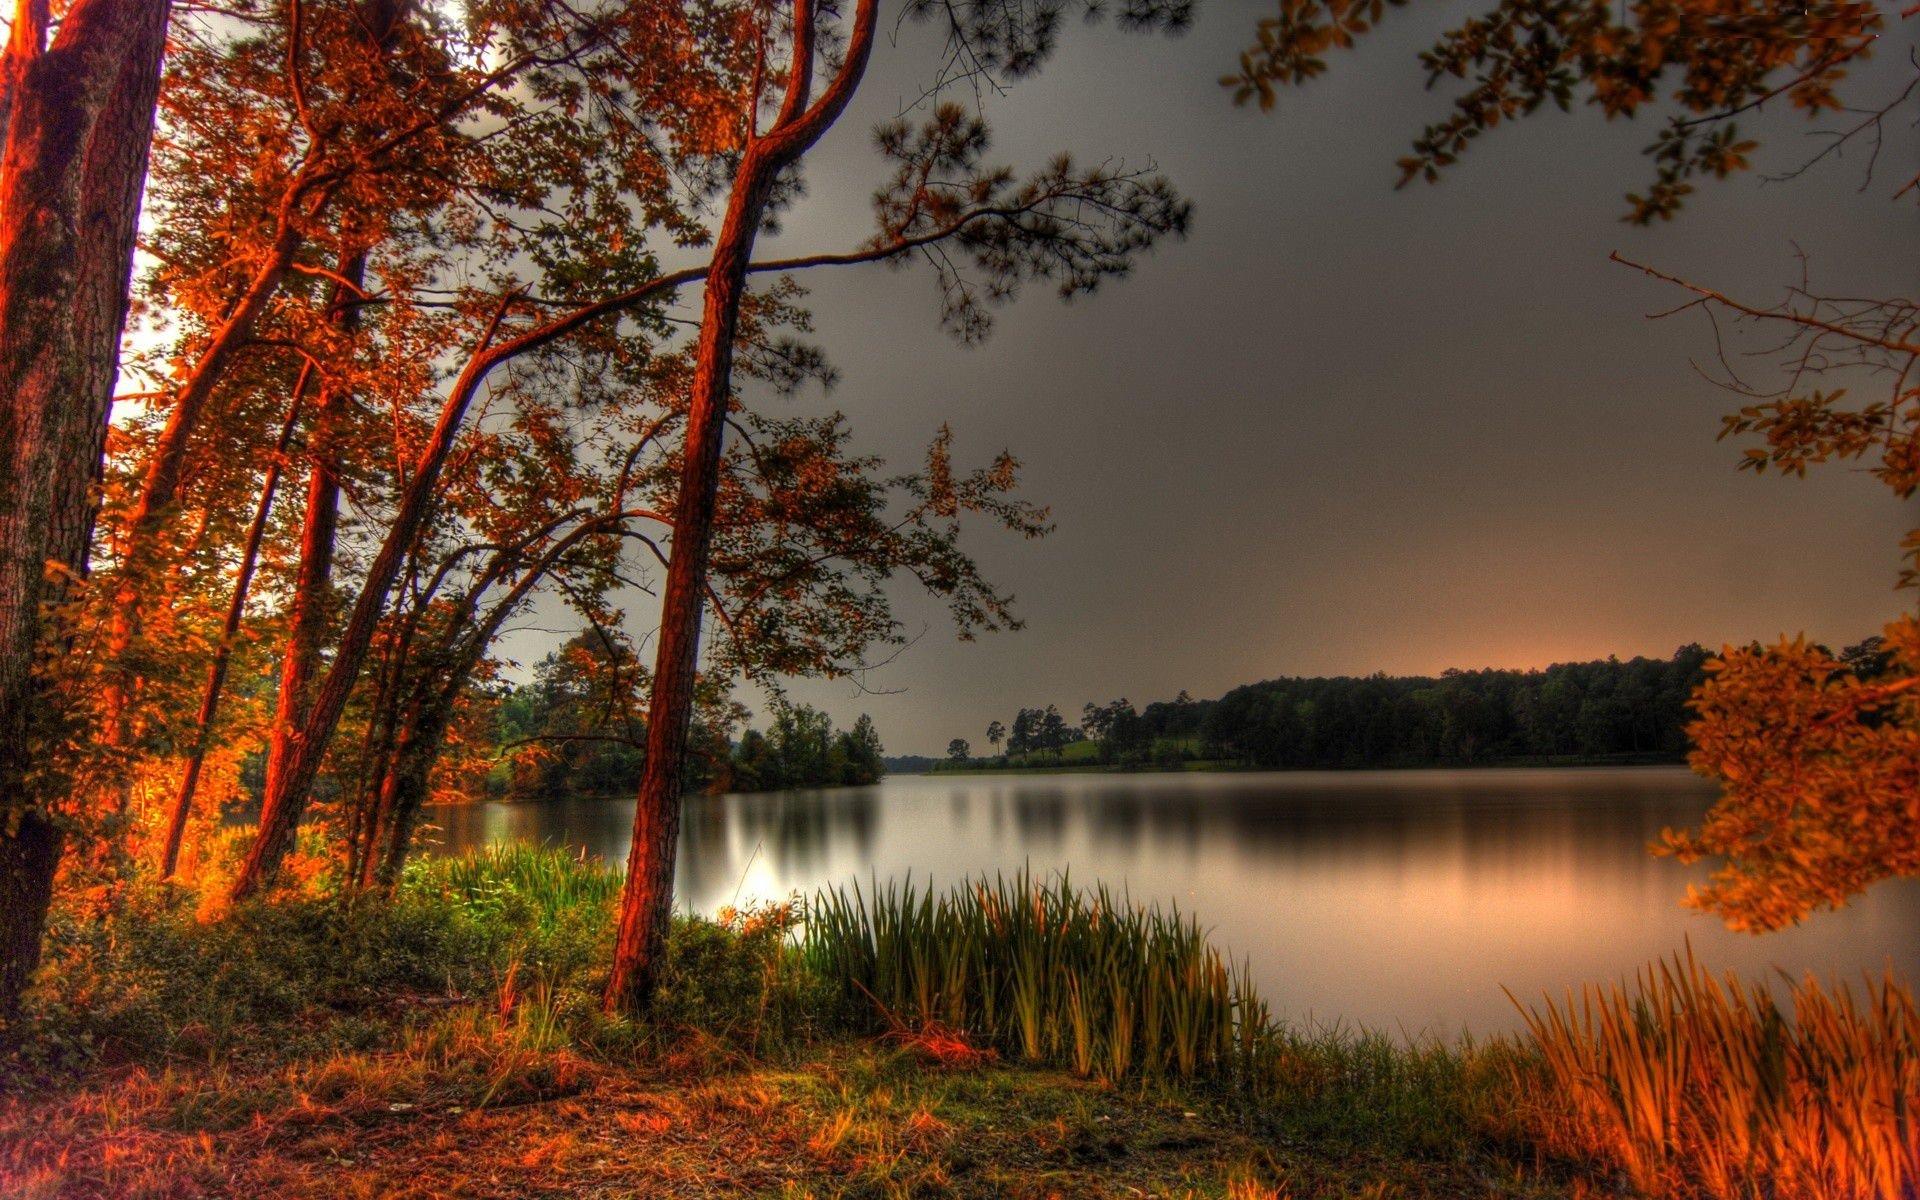 Full Screen Desktop Fall Leaves Wallpaper Nature Landscape Beauty Beautiful Sky Tree Lake Sunset